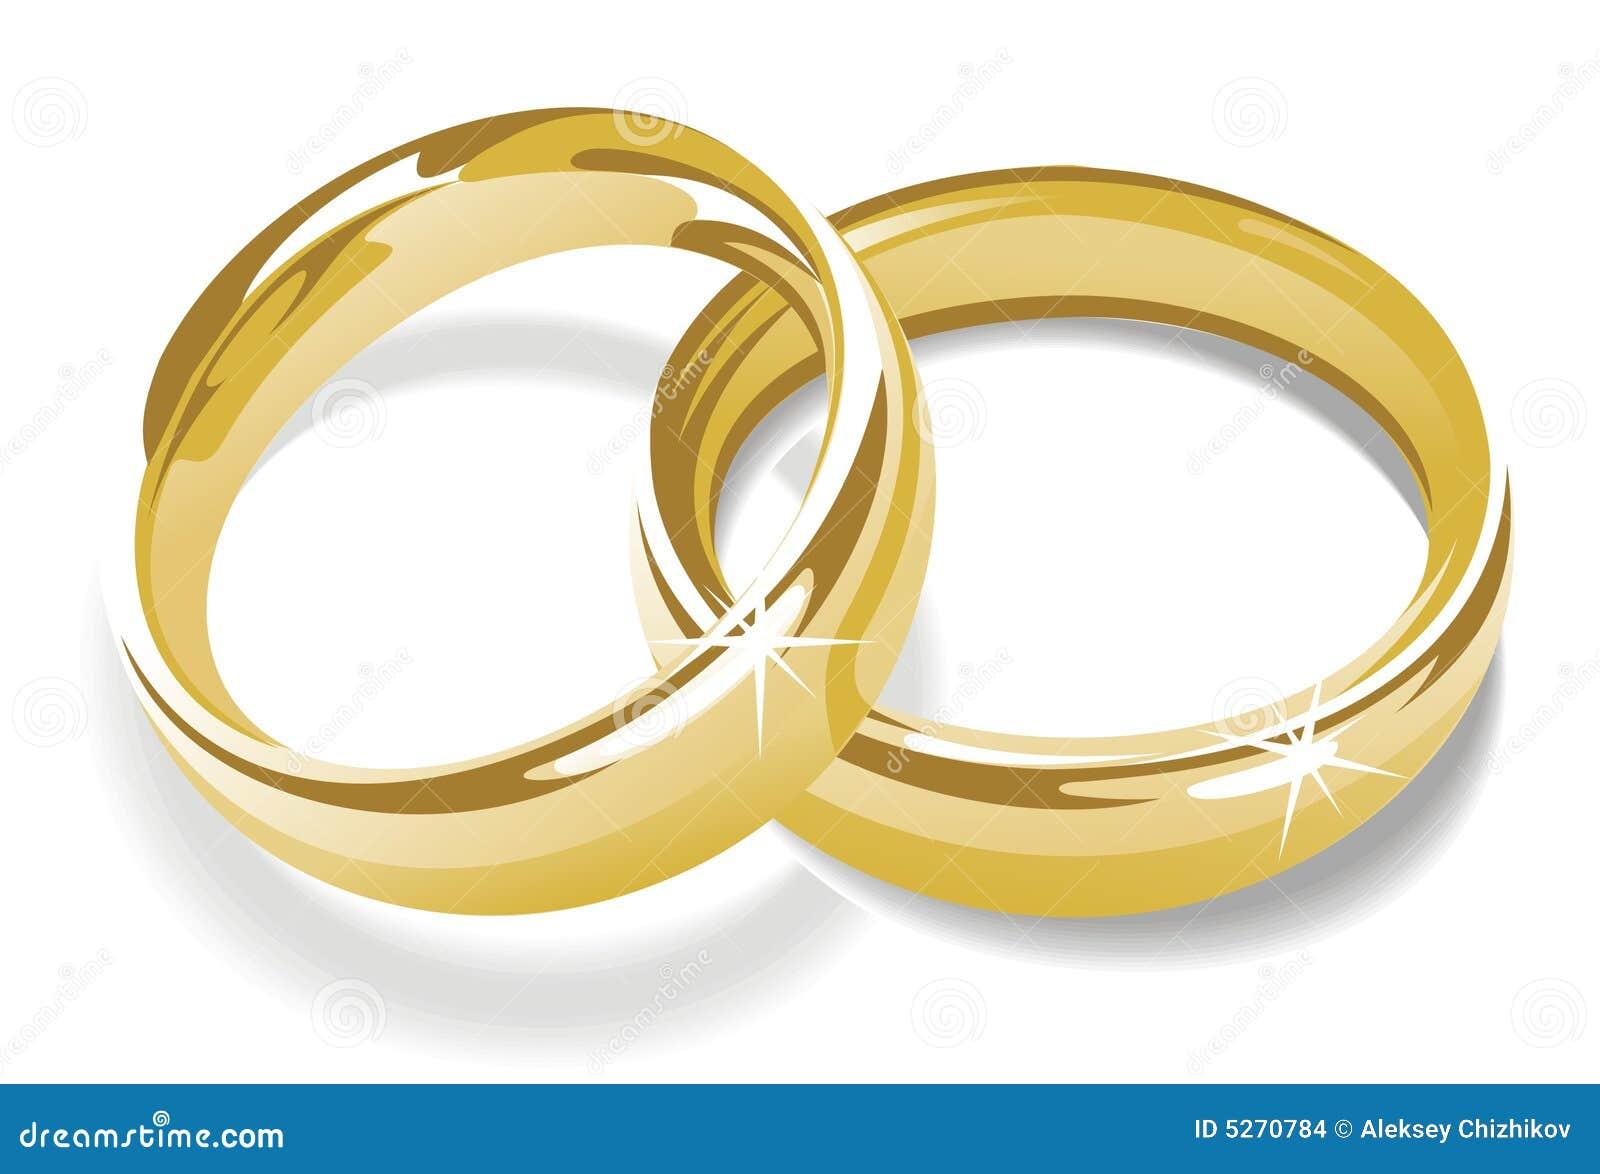 Frases cristianas por aniversario de bodas | Solo mensajes